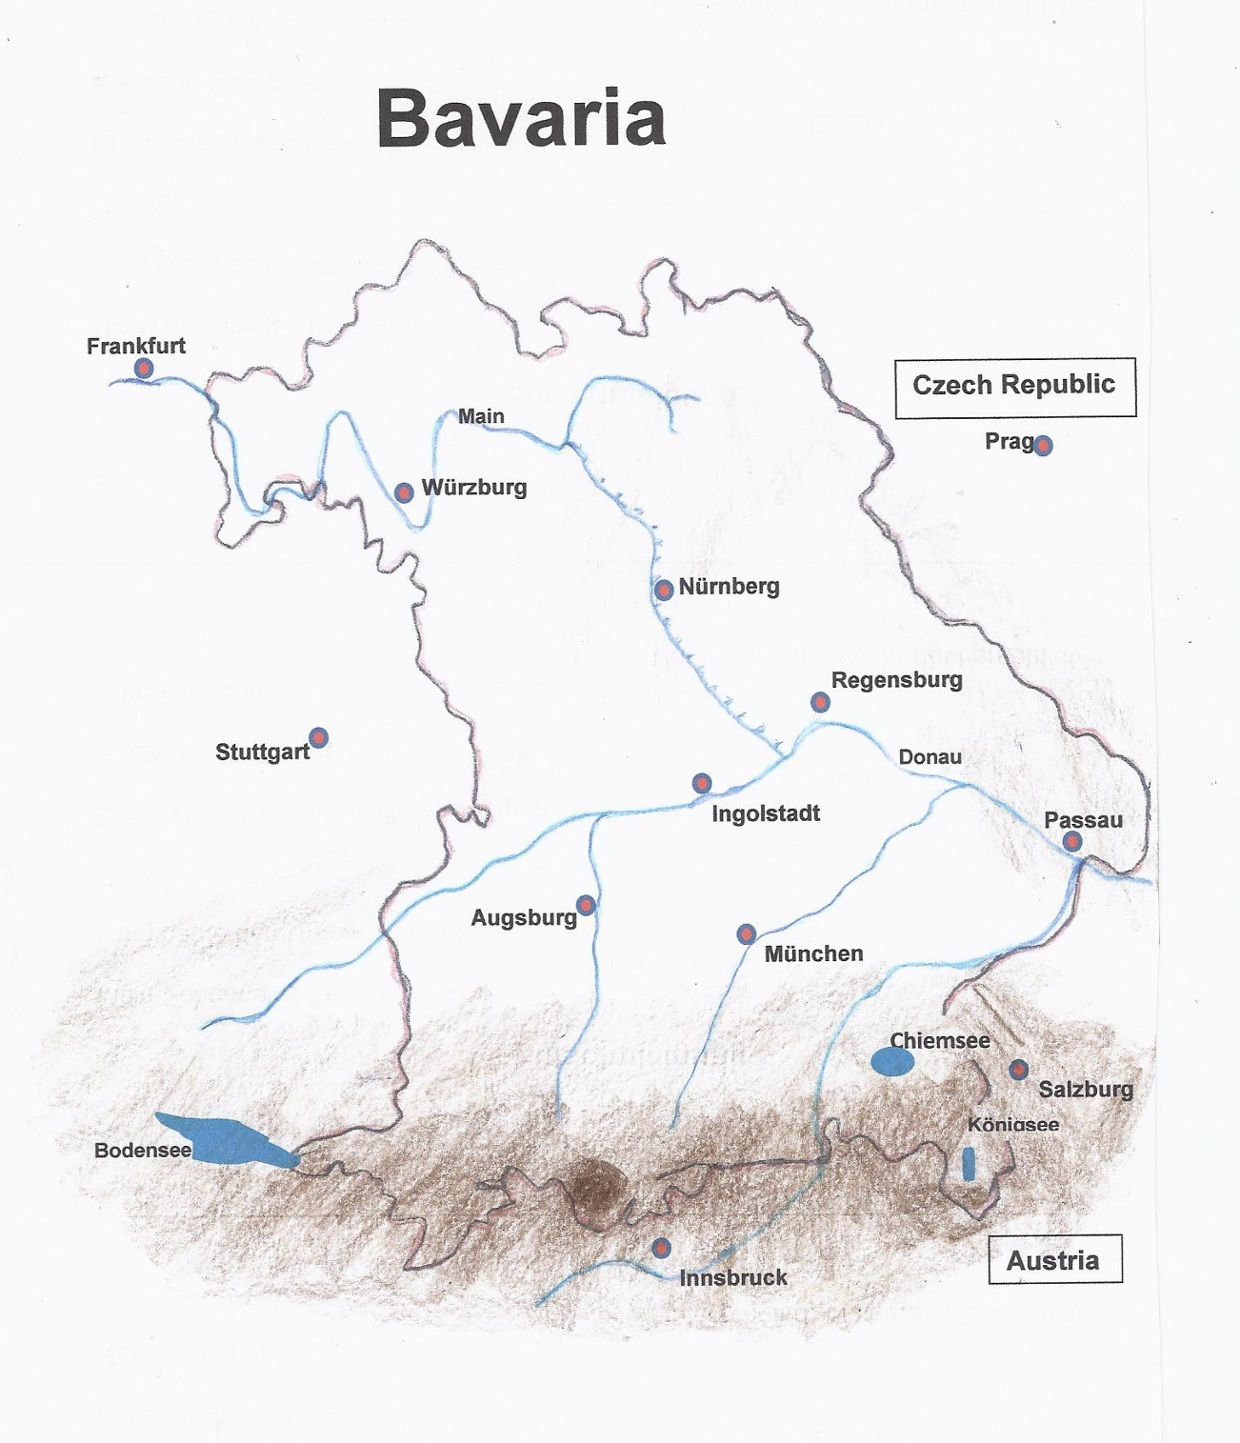 Flora in Bavaria